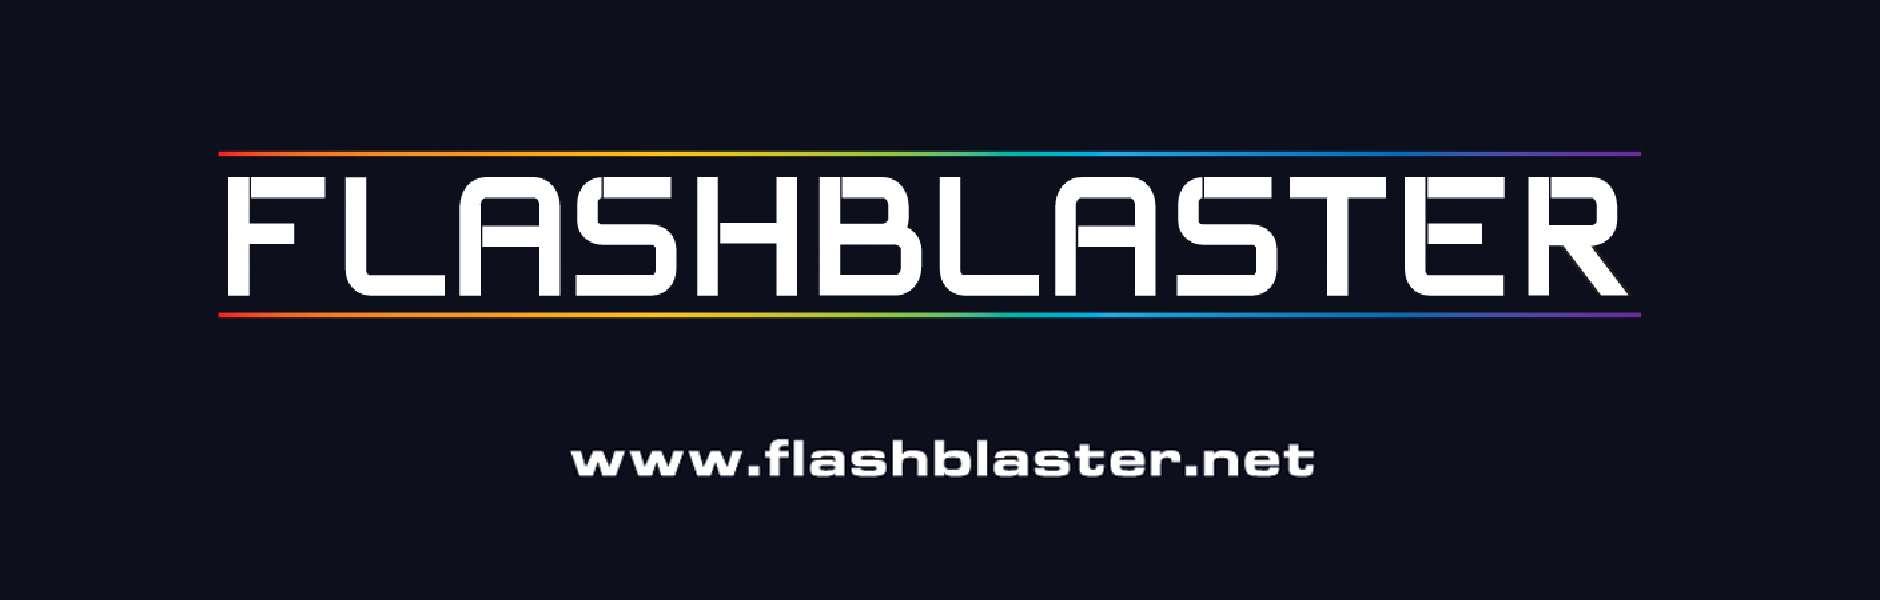 FLASHBLASTER